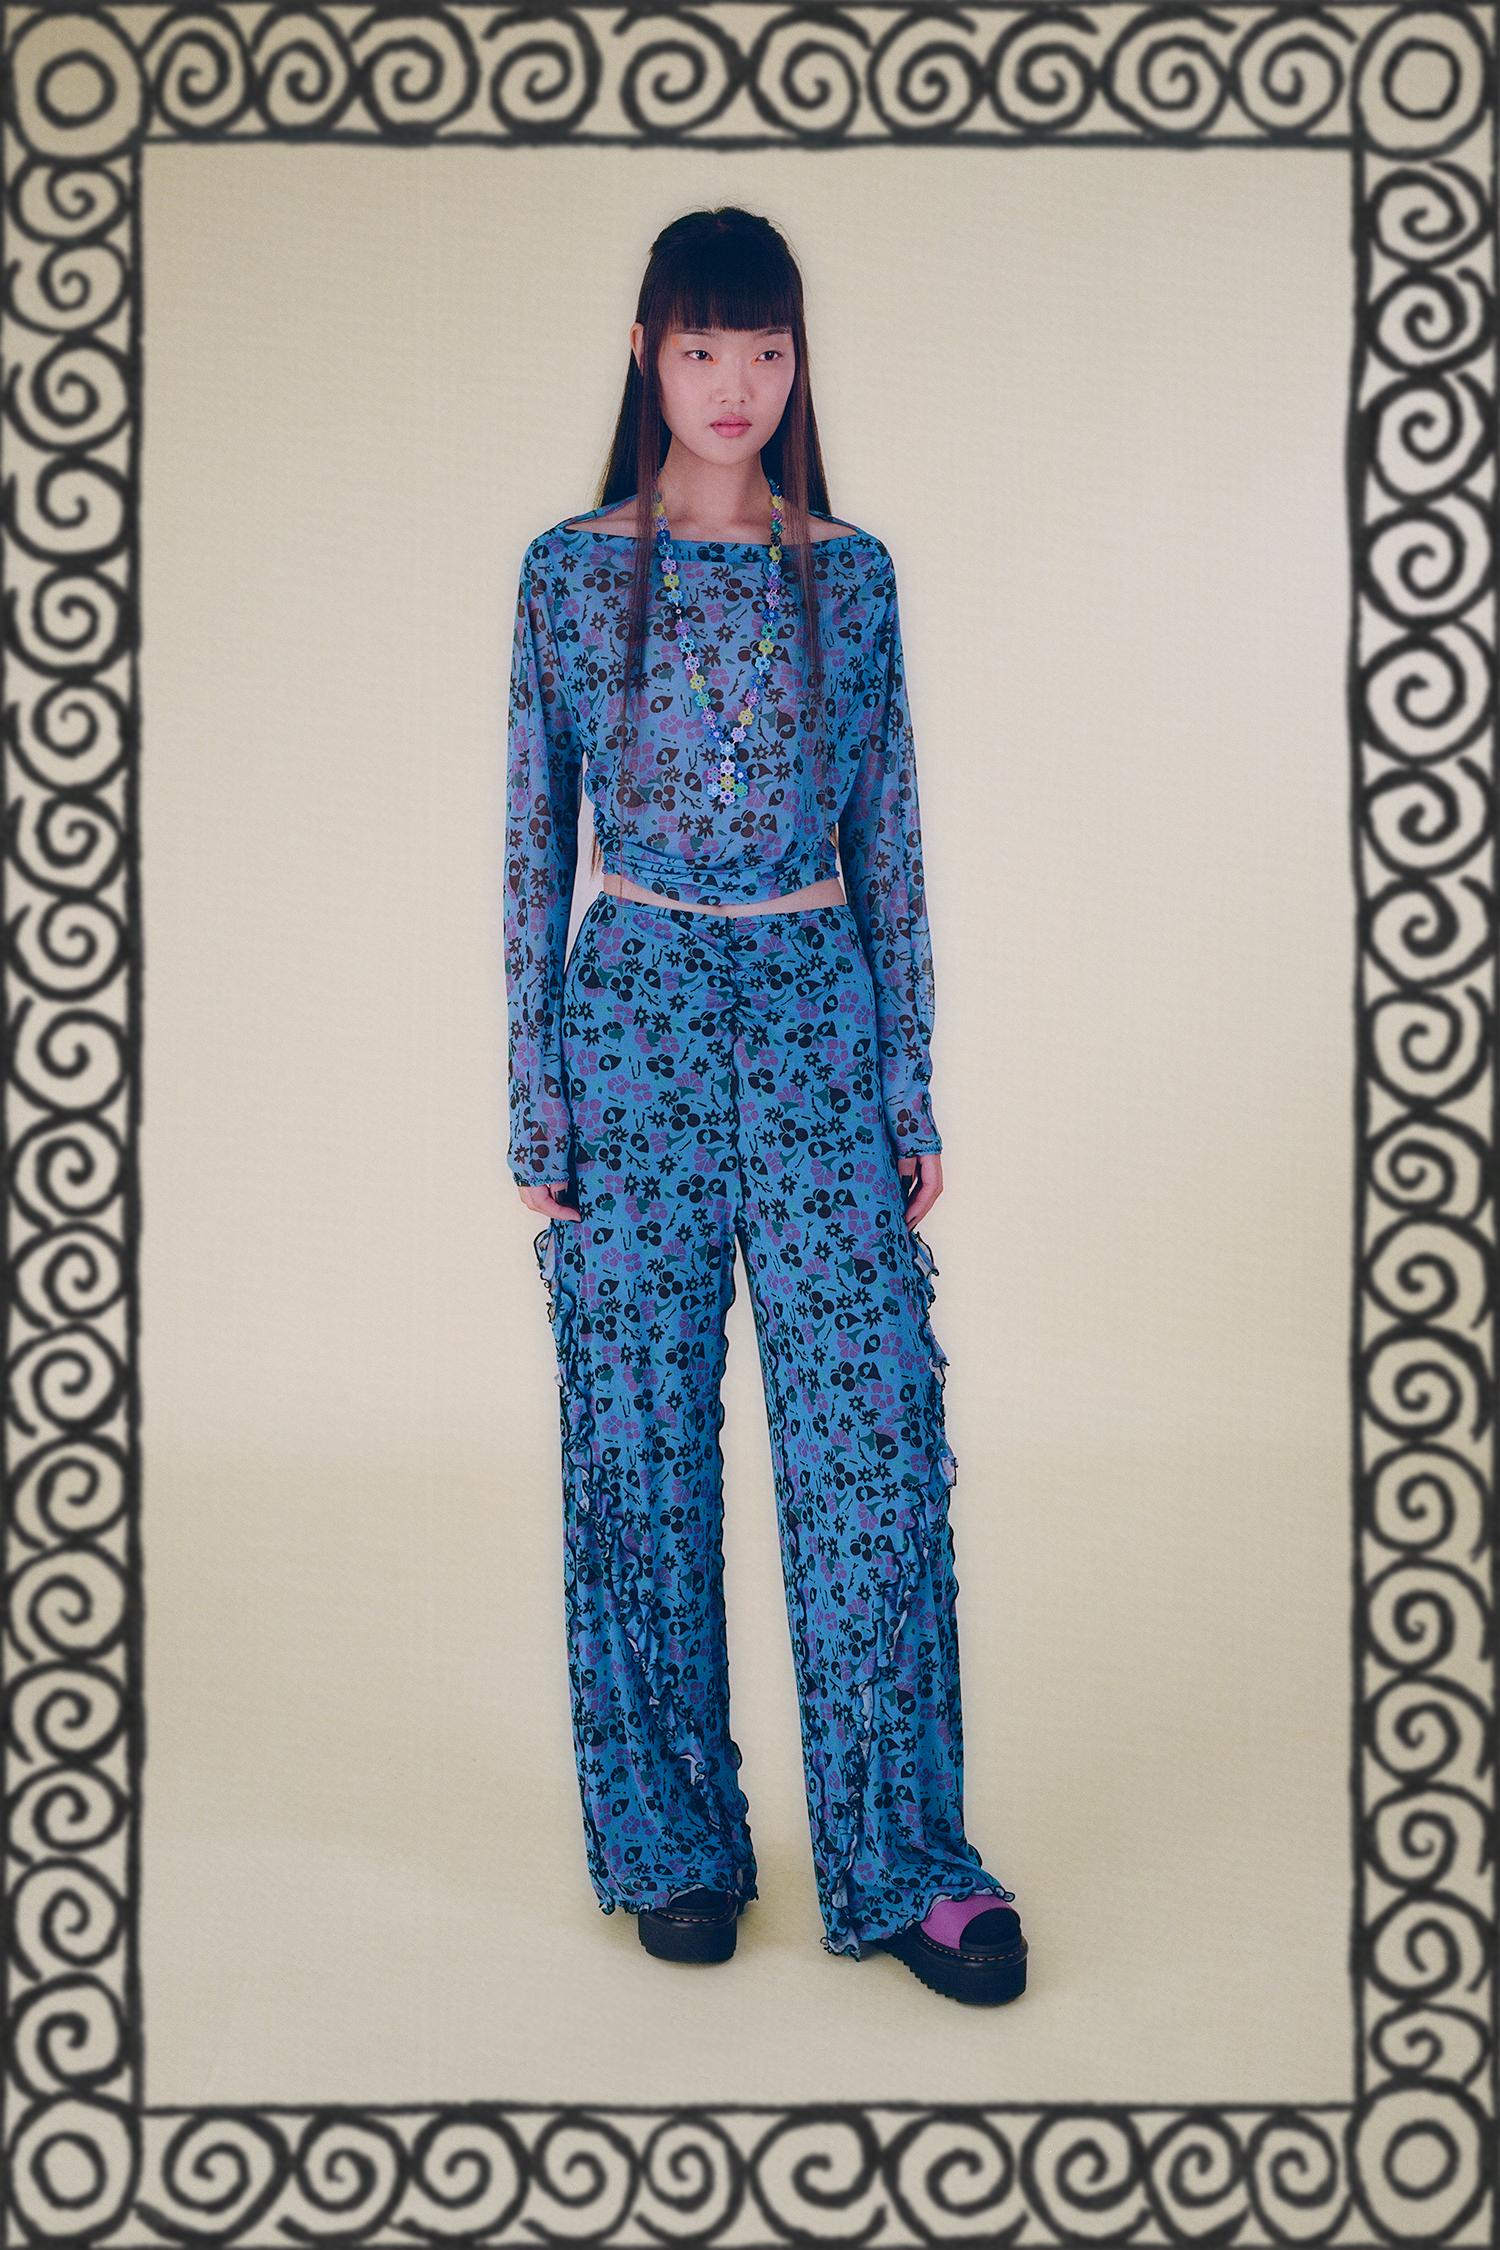 Anna Sui Resort 2022 Fashion Show Photos